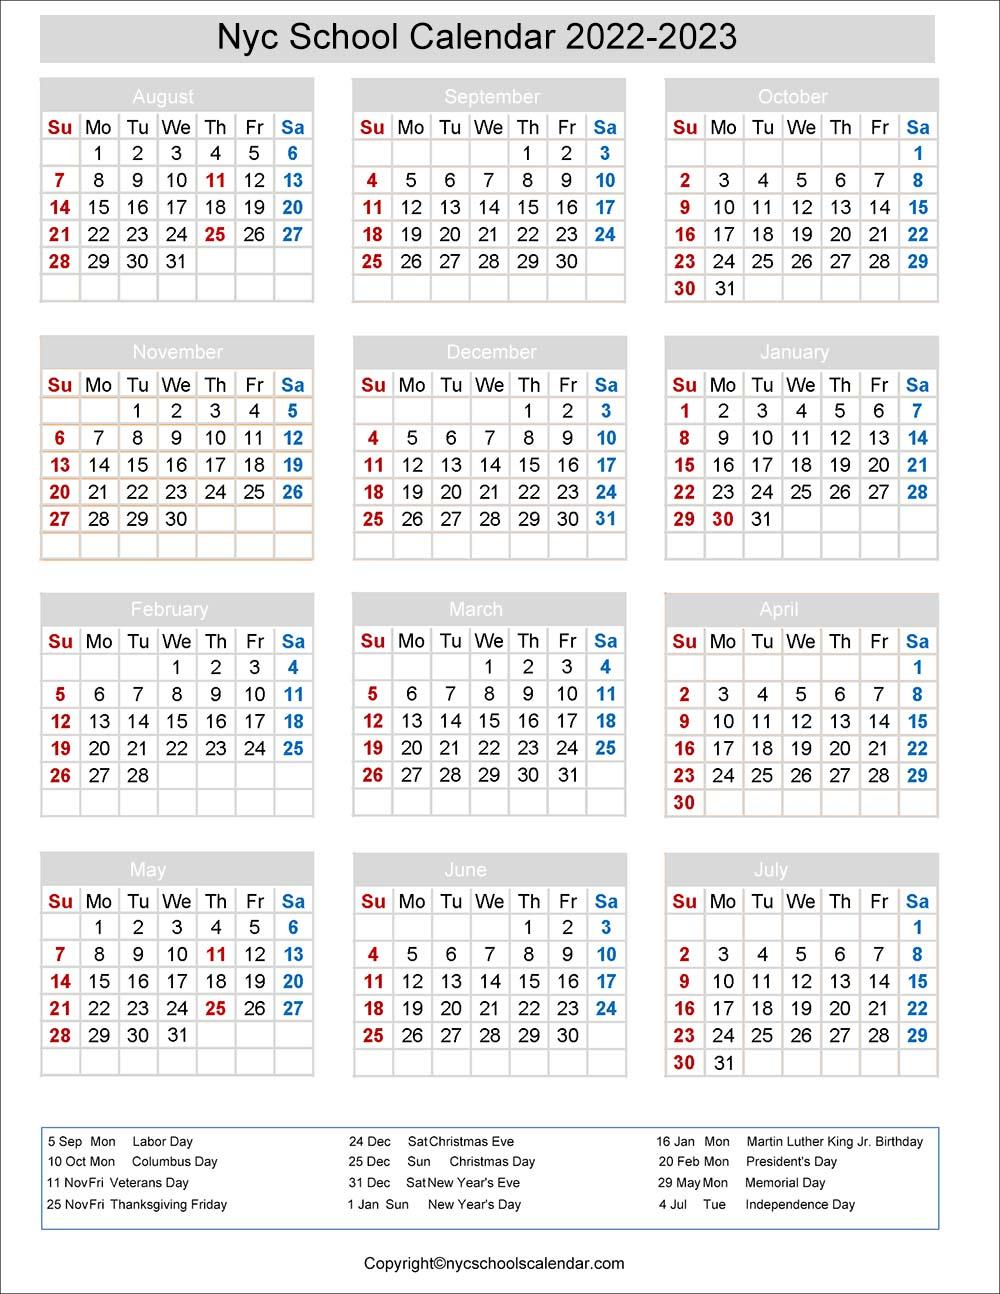 Nycdoe Calendar 2022.Nyc School Holidays Calendar 2022 2023